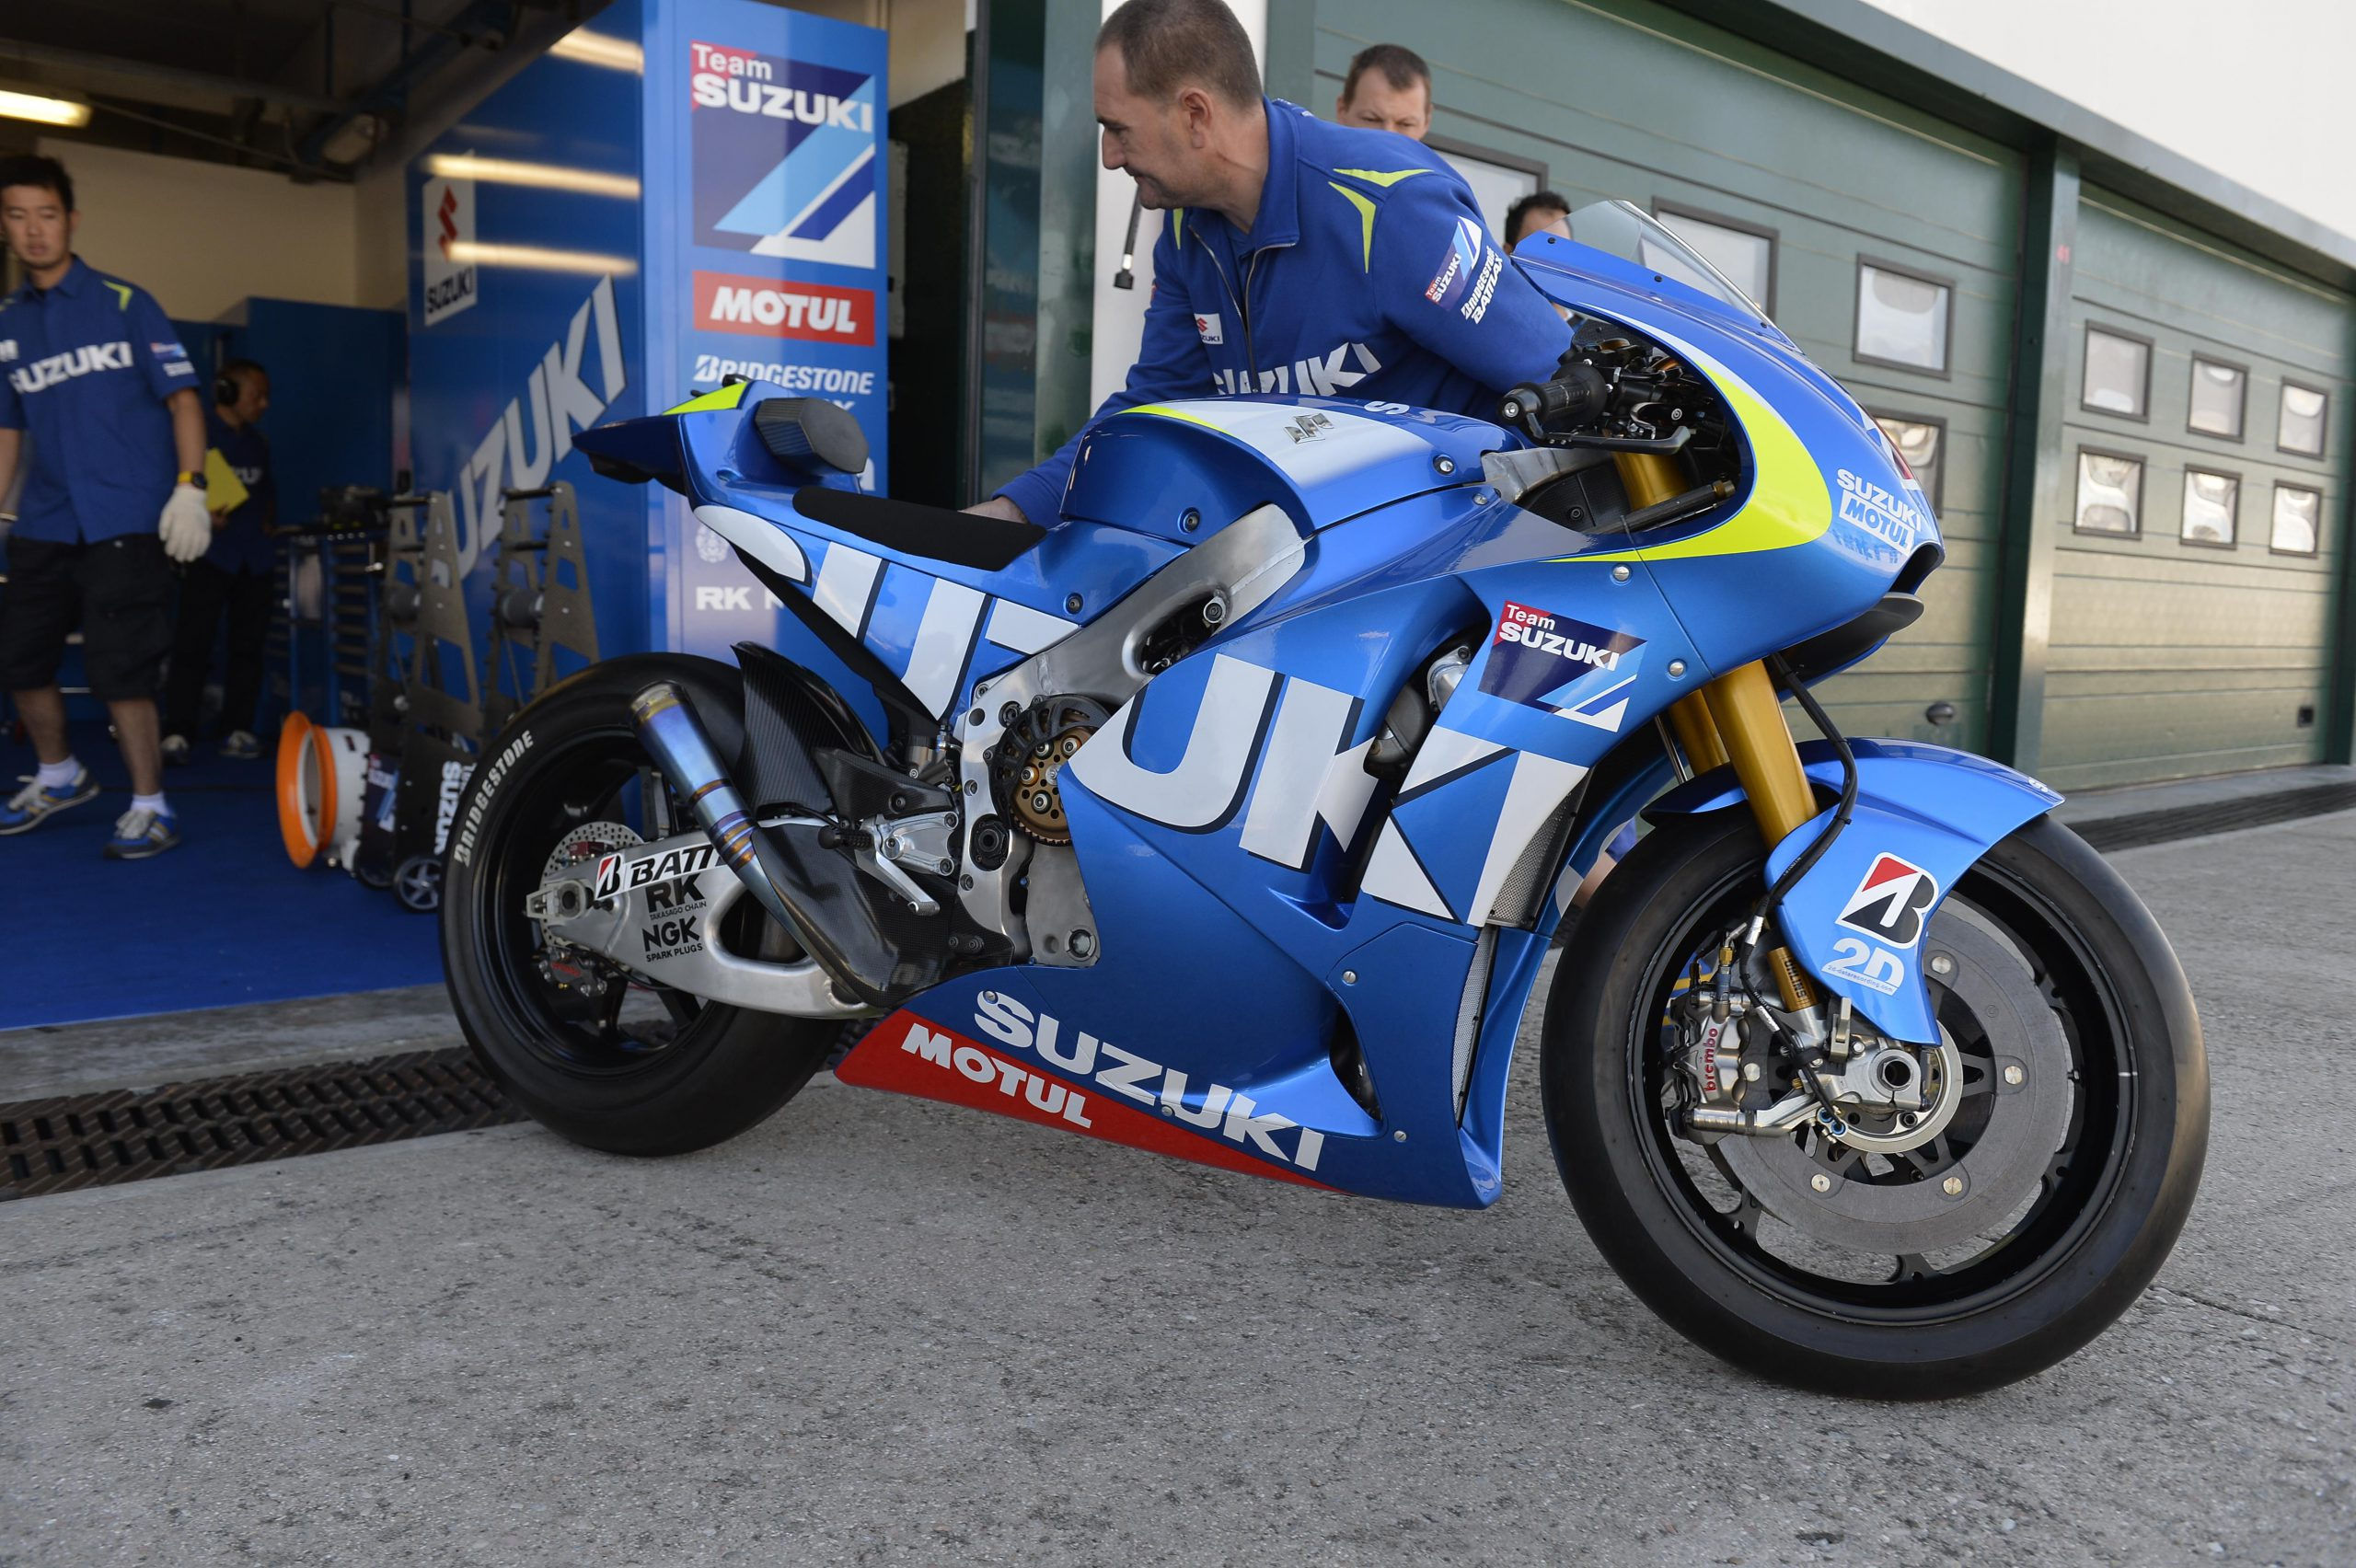 History Revisited – Suzuki's MotoGP Development Report 4 Video – 2013